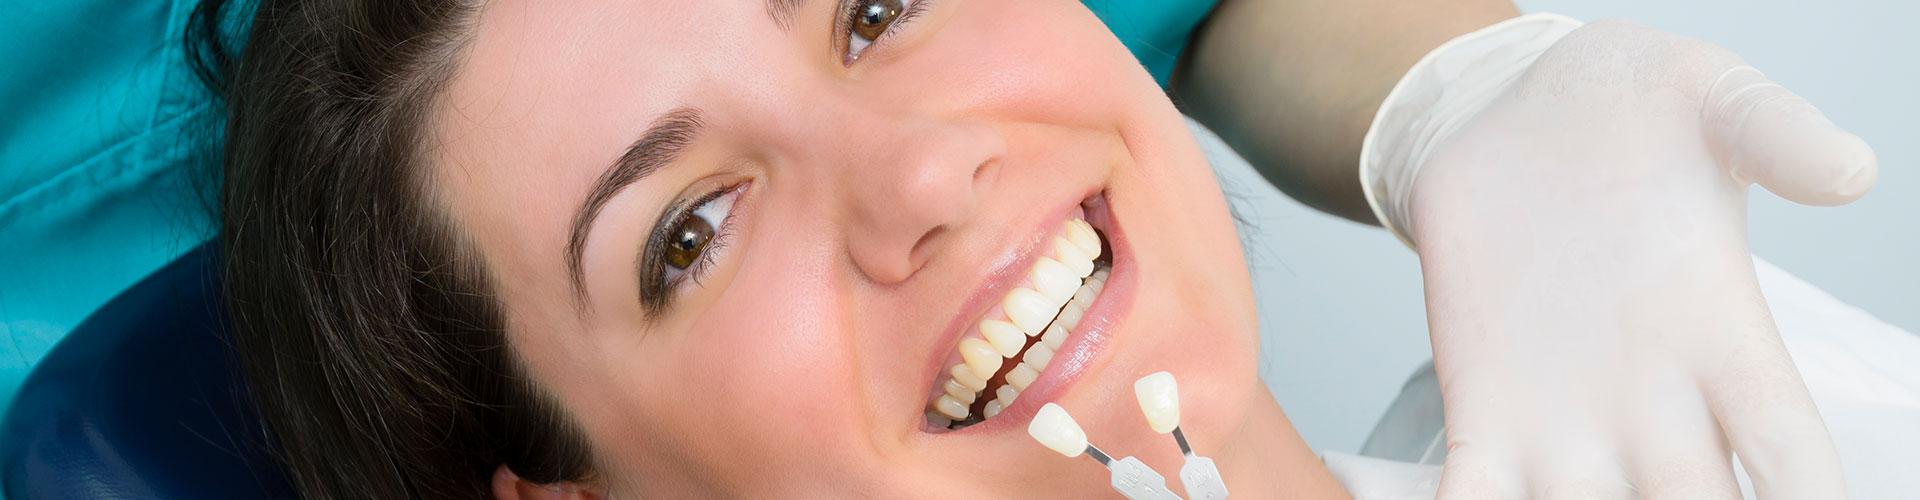 Woman smiling at the dental